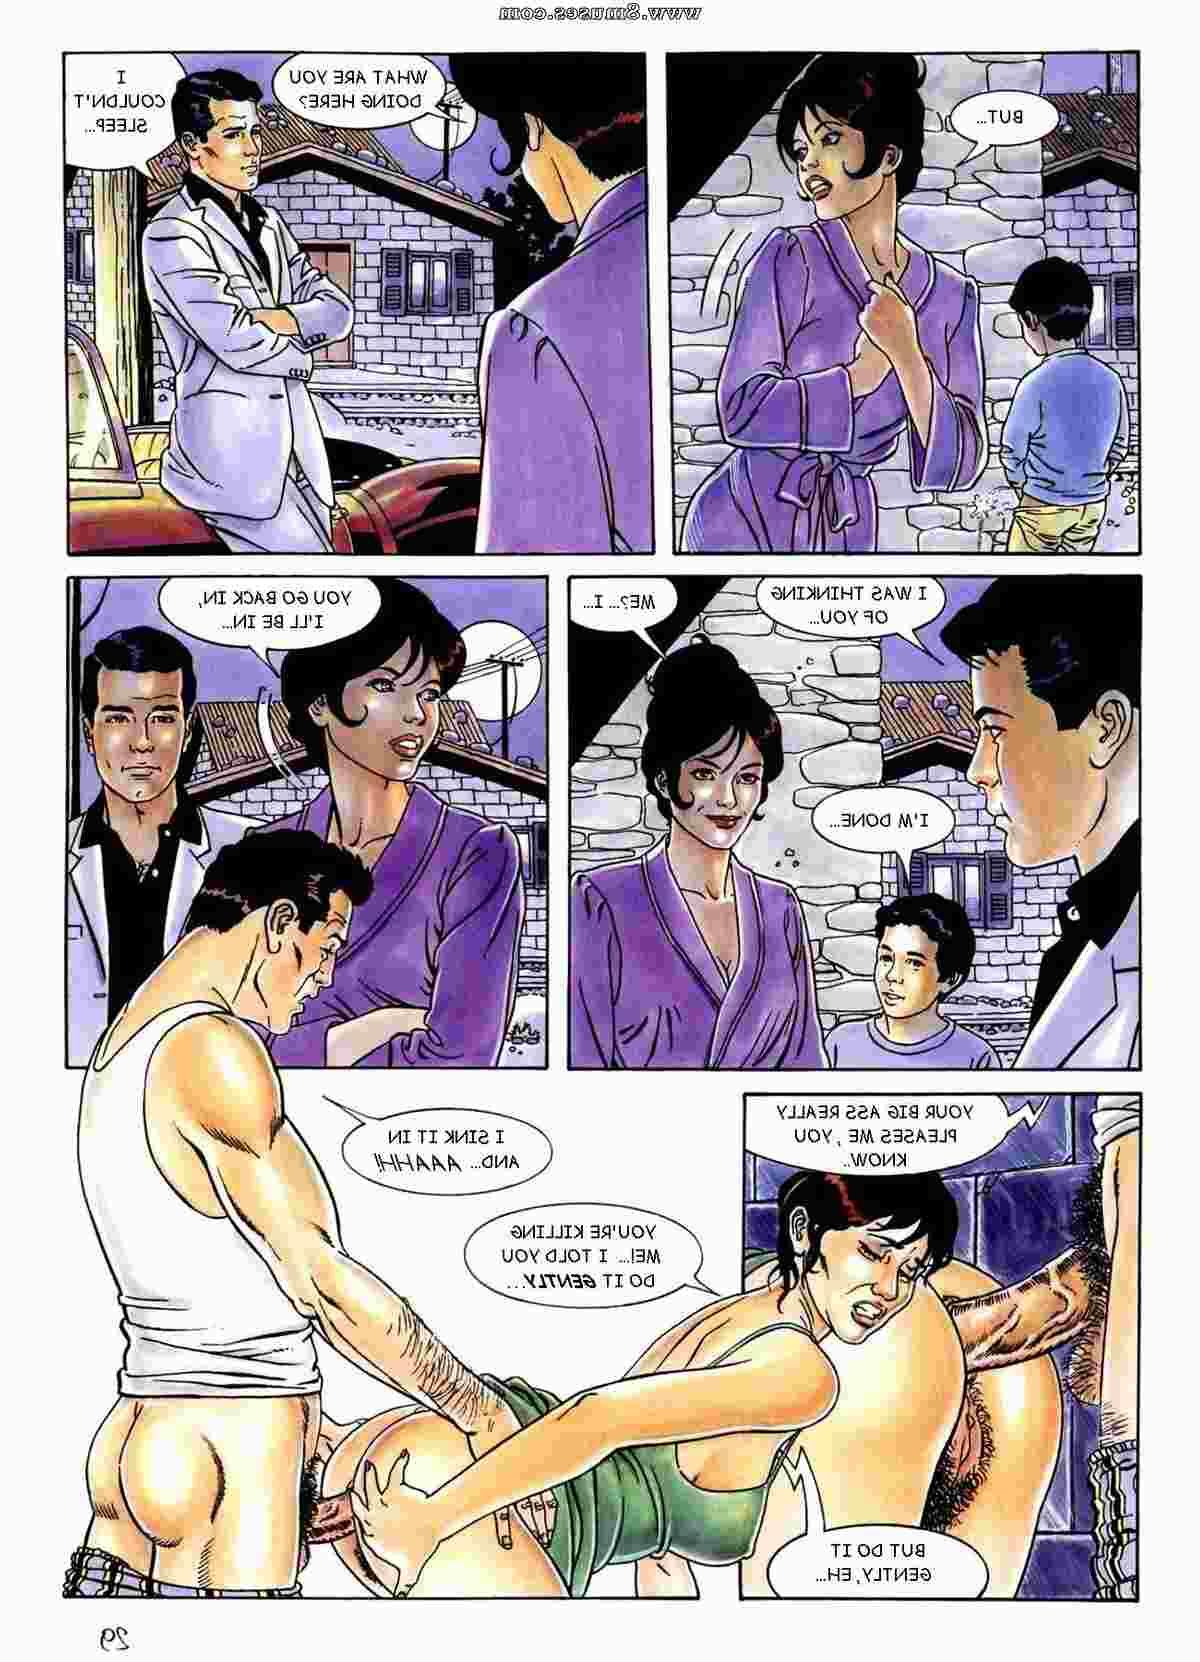 Stramaglia-Morale-Comics/Anna-Perverted-Innocence Anna_Perverted_Innocence__8muses_-_Sex_and_Porn_Comics_32.jpg